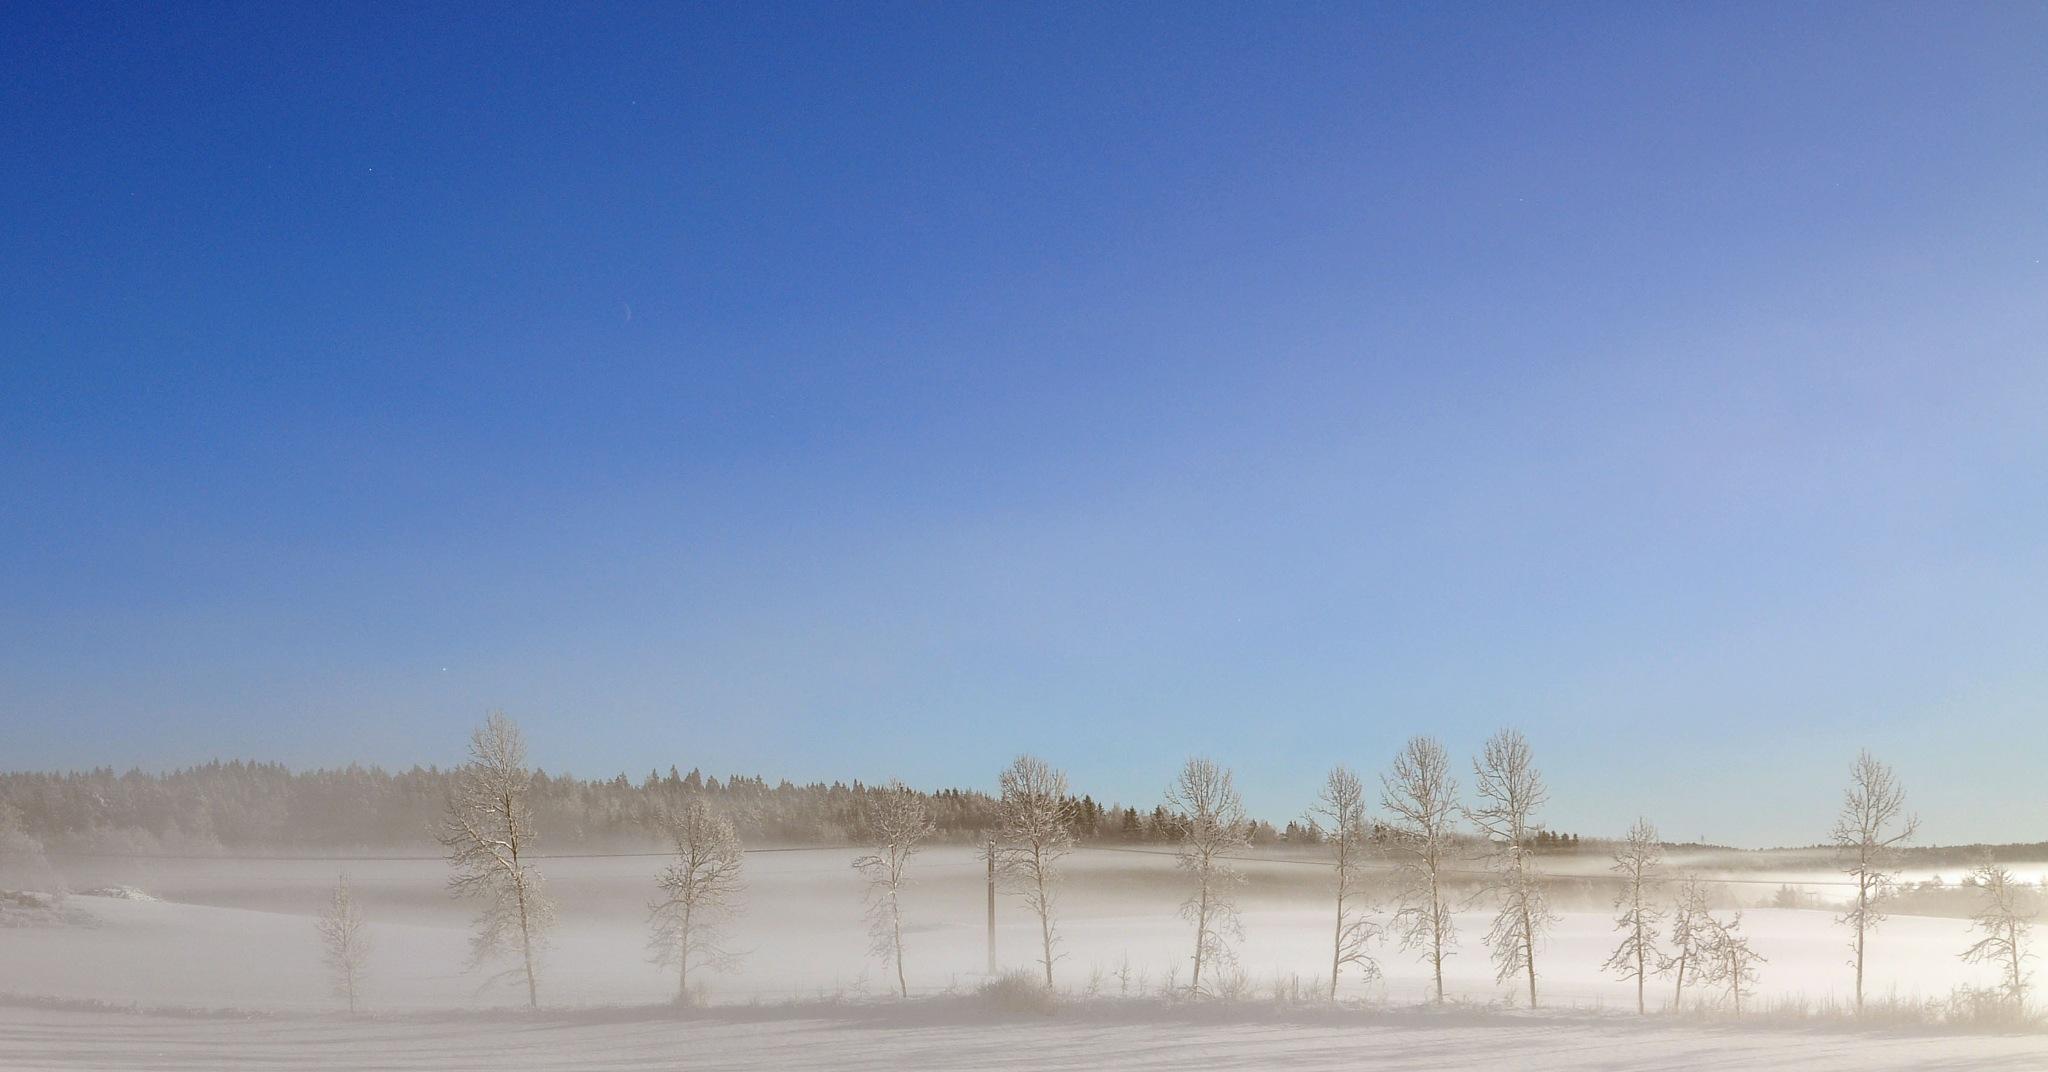 Untitled by Morten Andersen